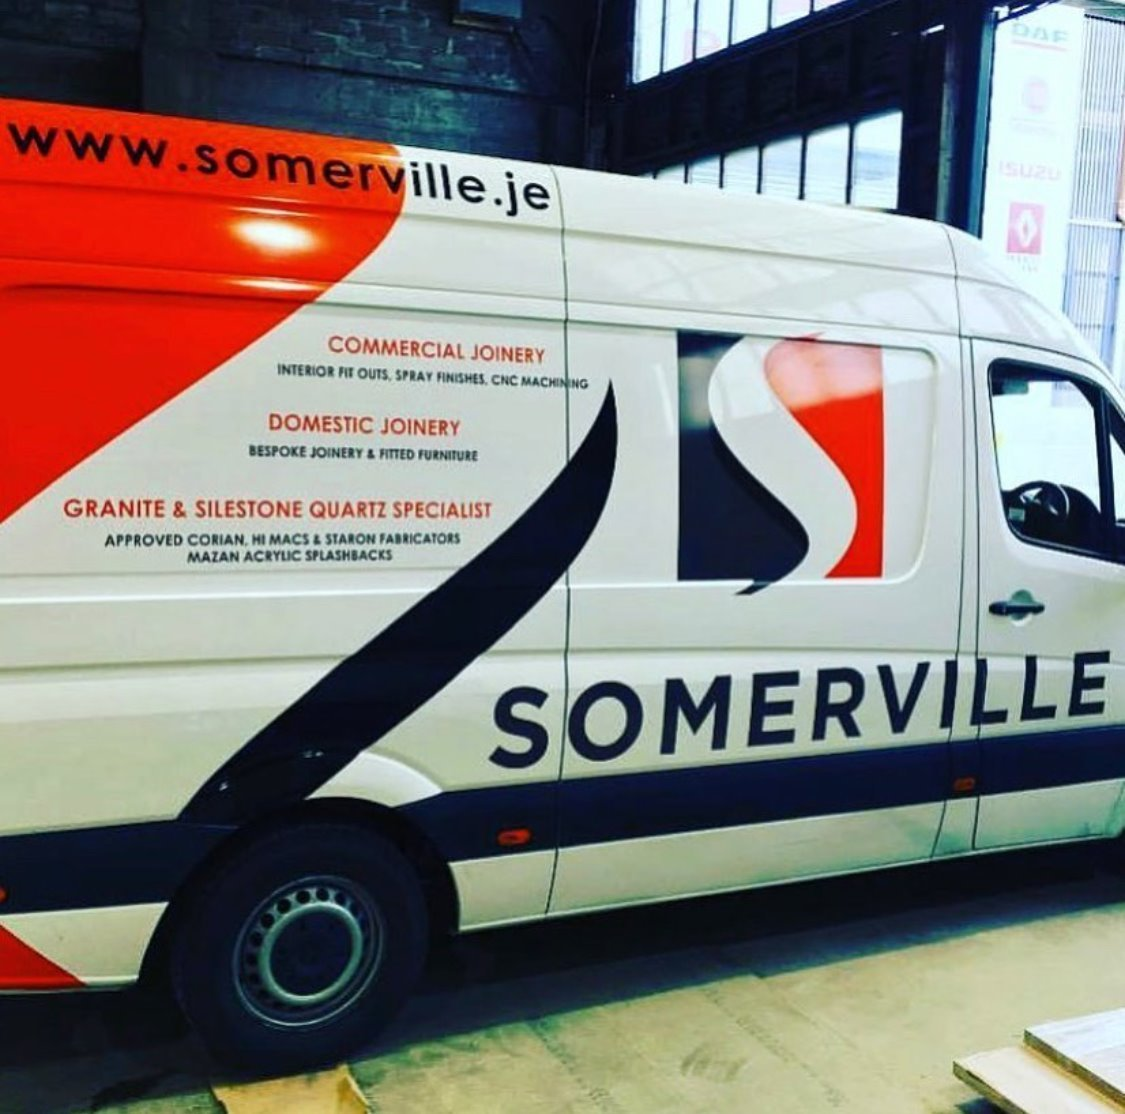 Somerville Ltd